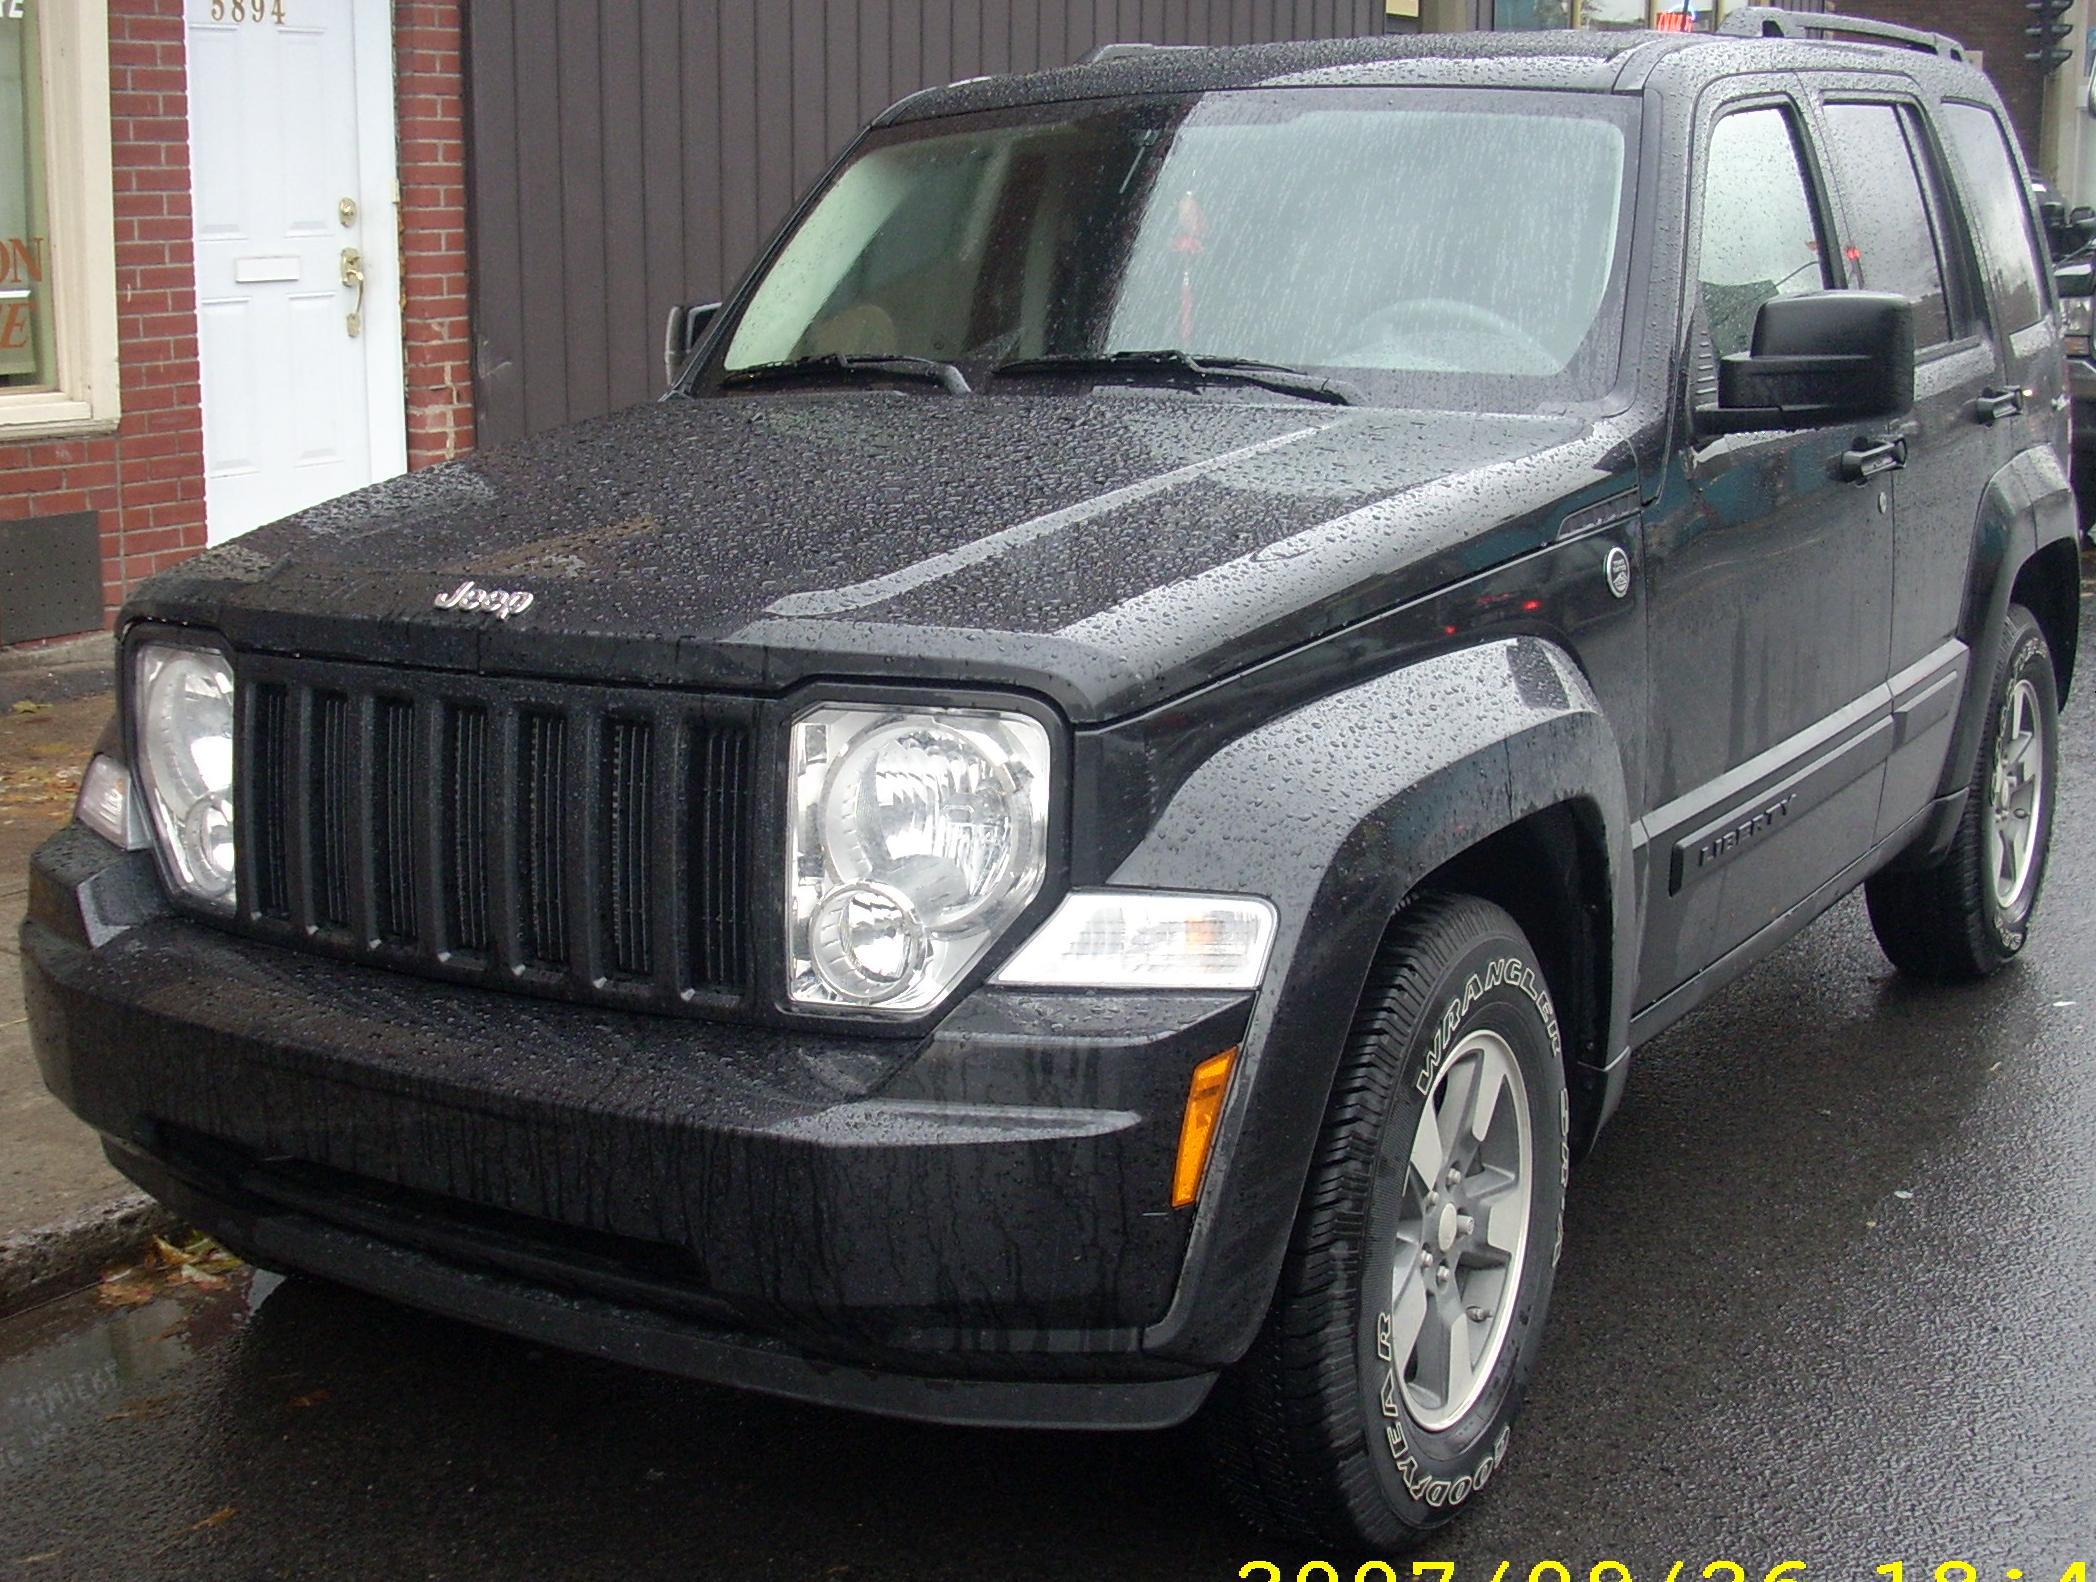 2008 jeep liberty - image #8